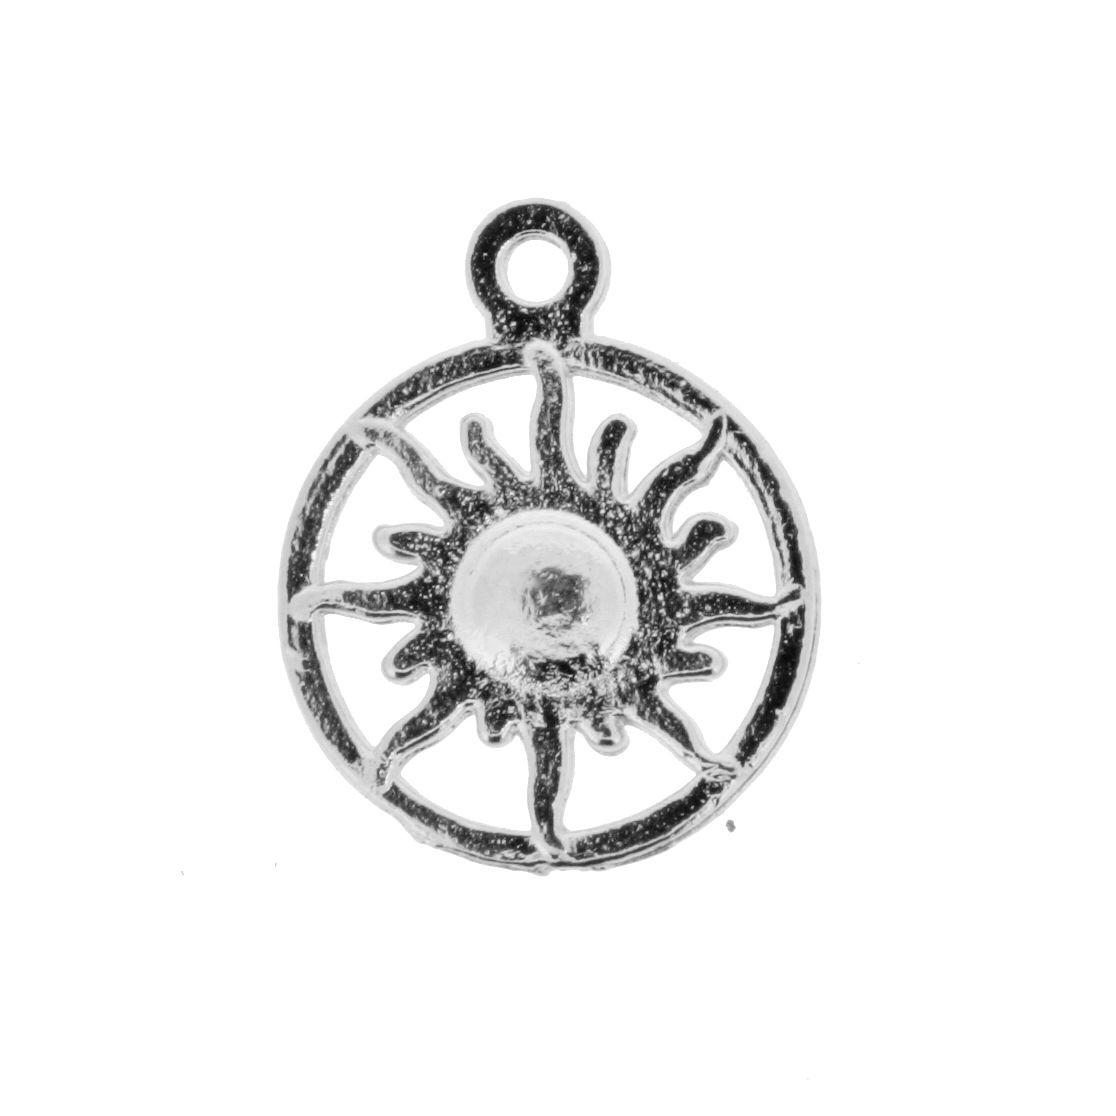 Sol - Níquel - 20mm  - Stéphanie Bijoux® - Peças para Bijuterias e Artesanato